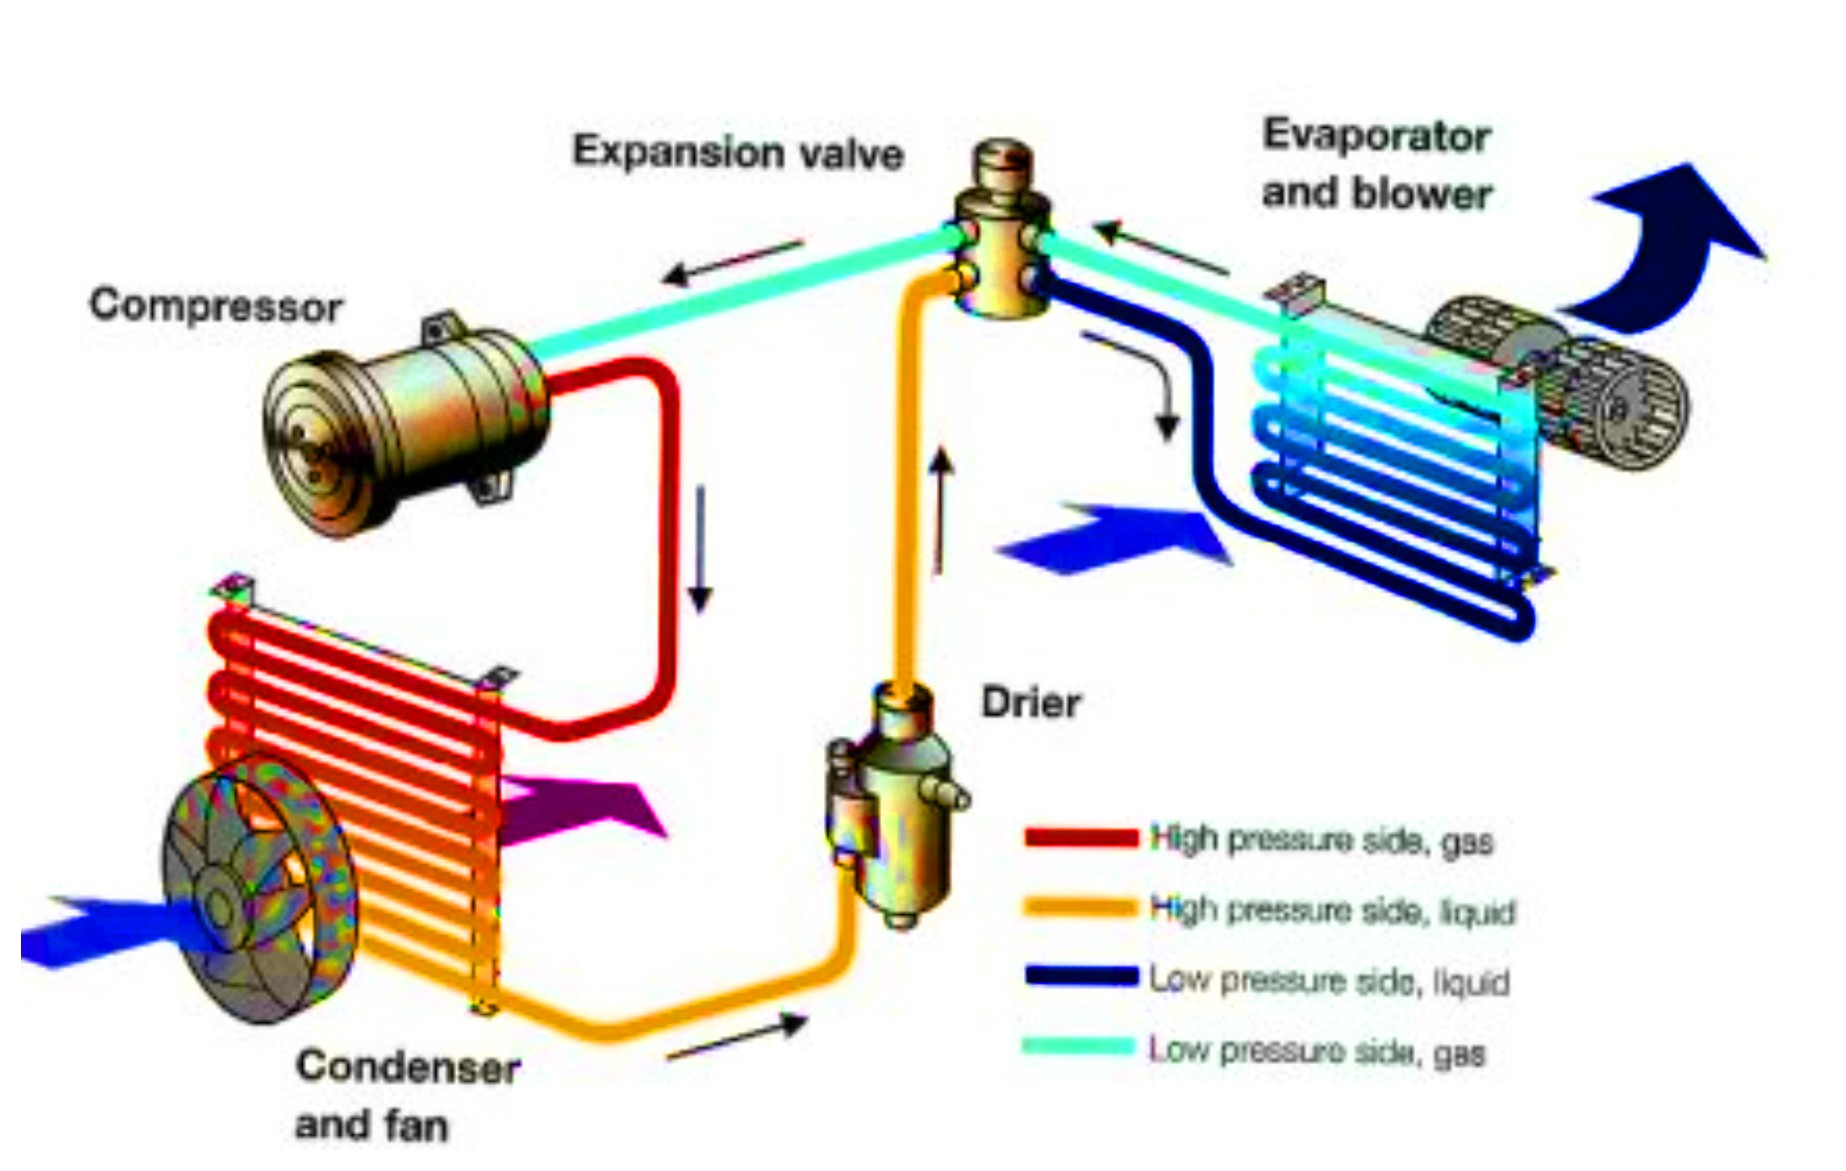 Car Ac System Diagram Car Car A C Pressor Wiring Diagram Auto Air Conditioning Of Car Ac System Diagram